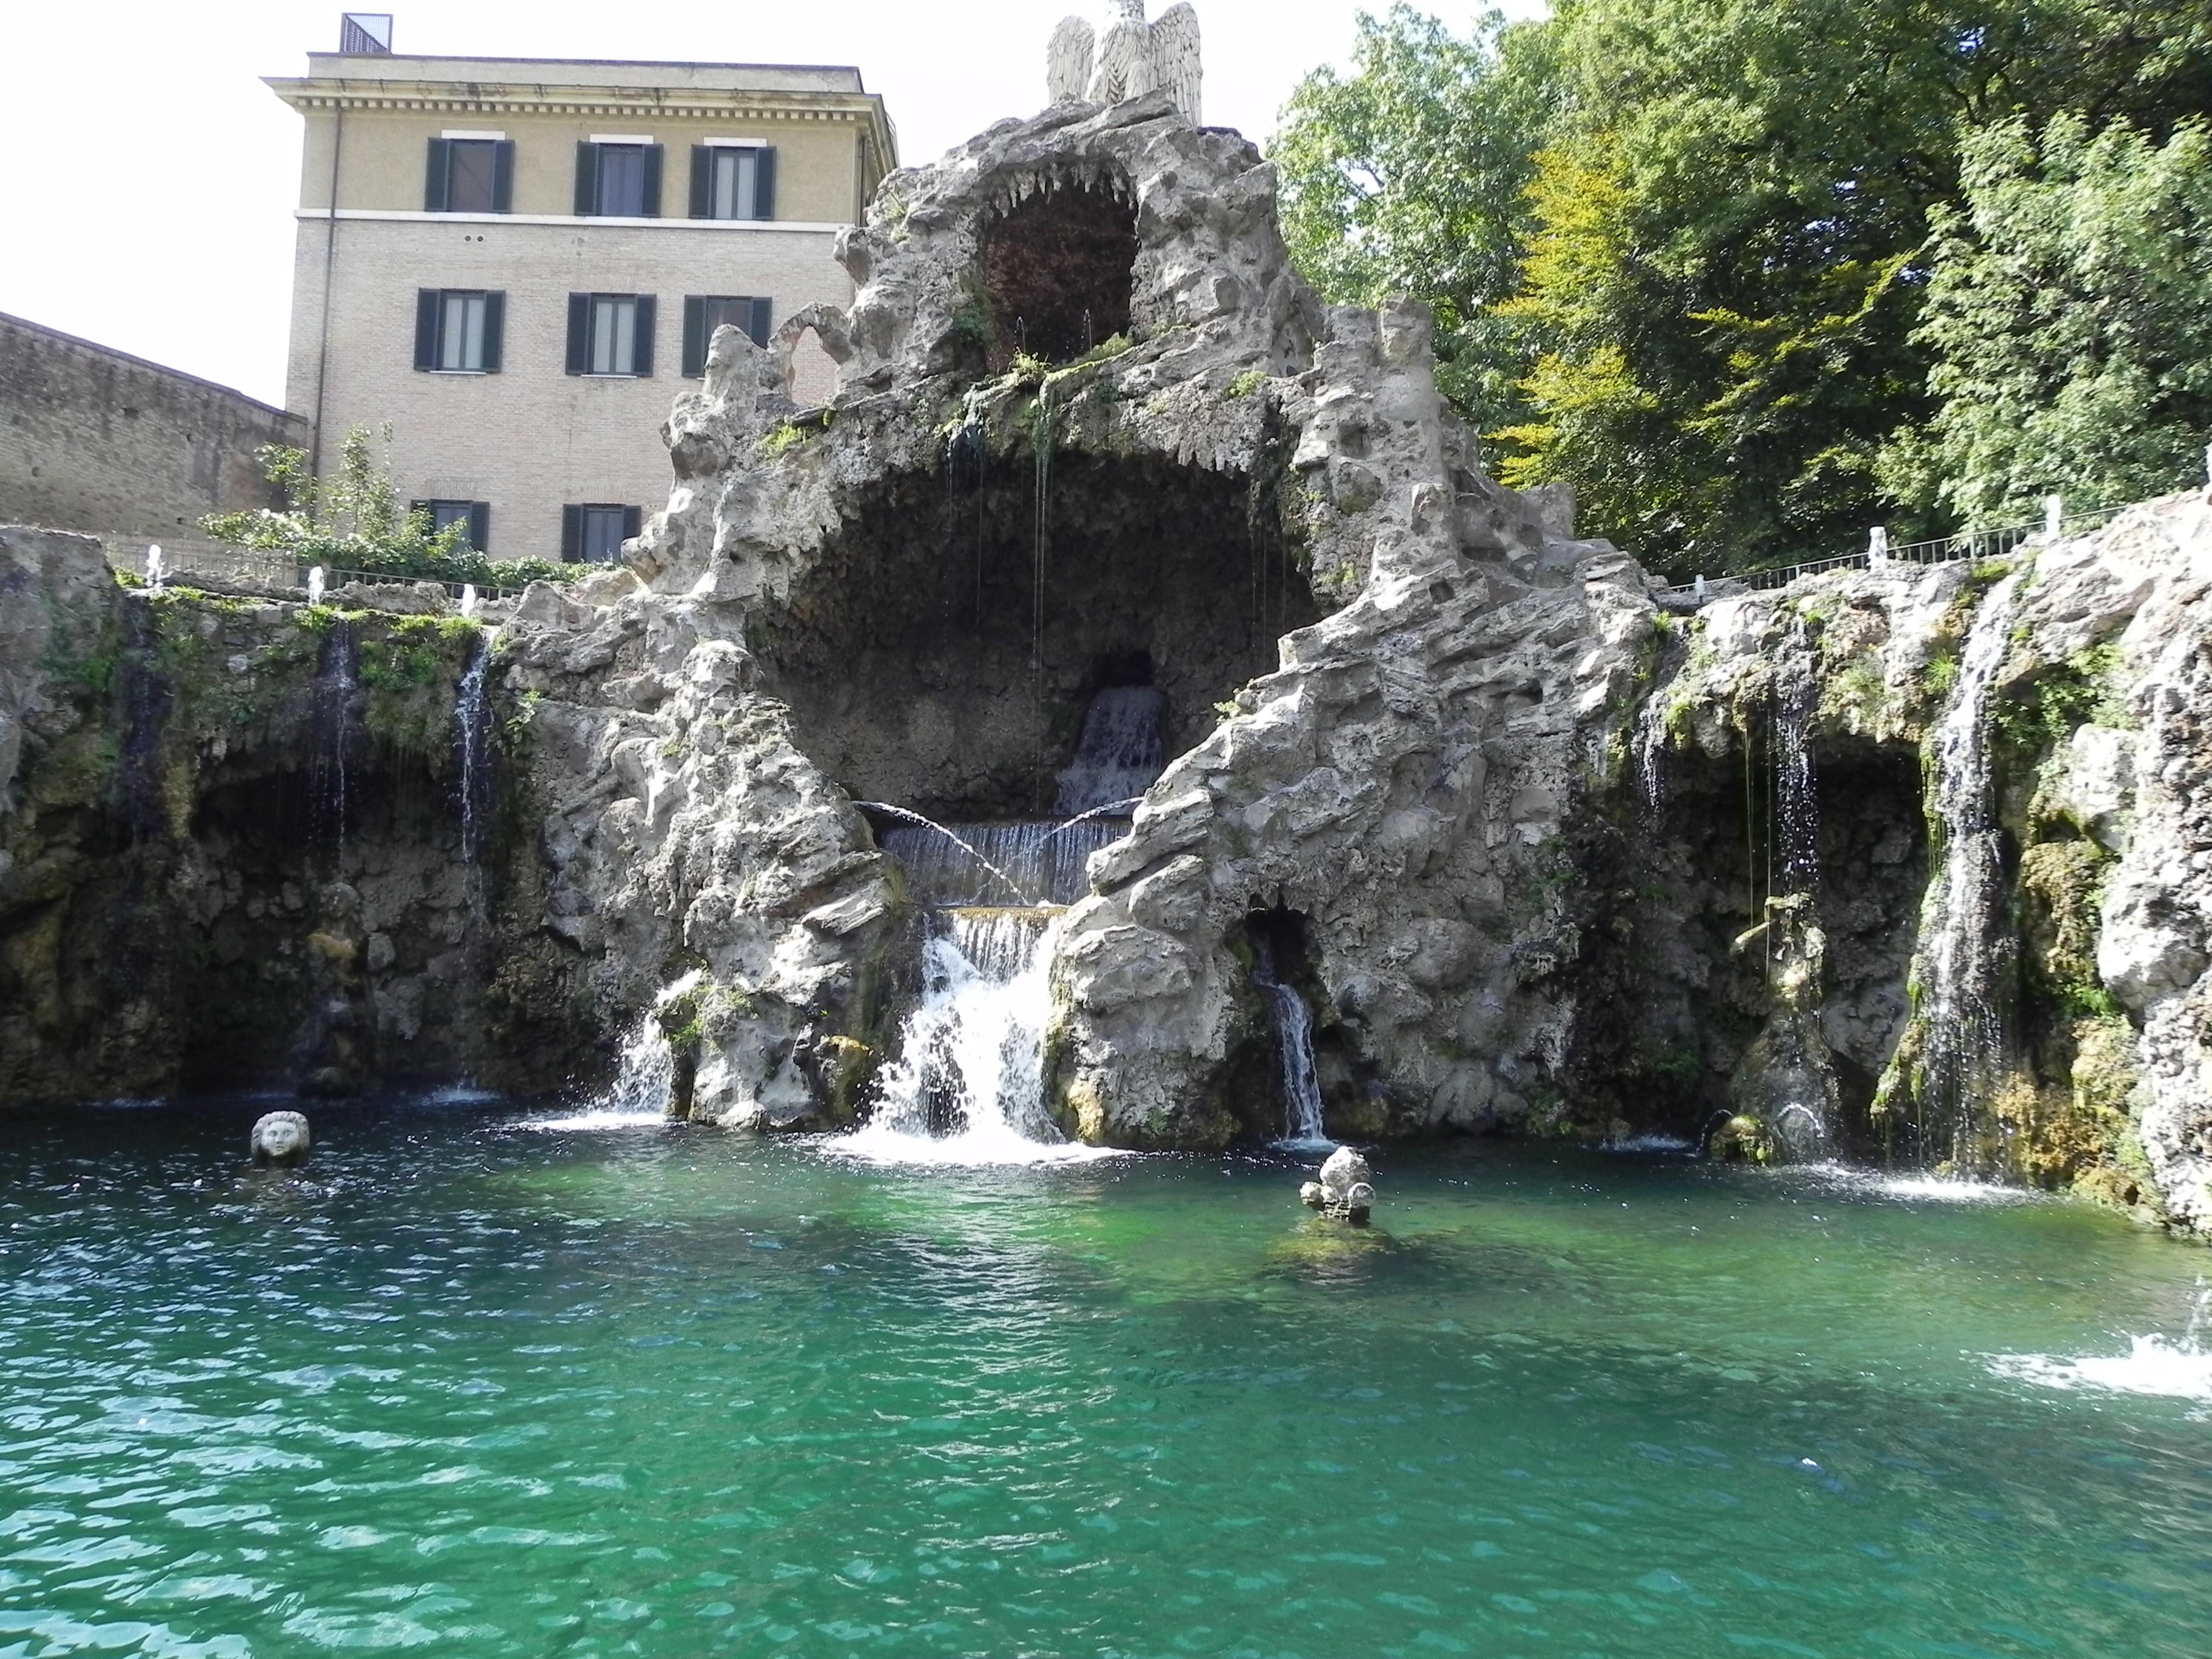 Giardini vaticani for Giardini immagini